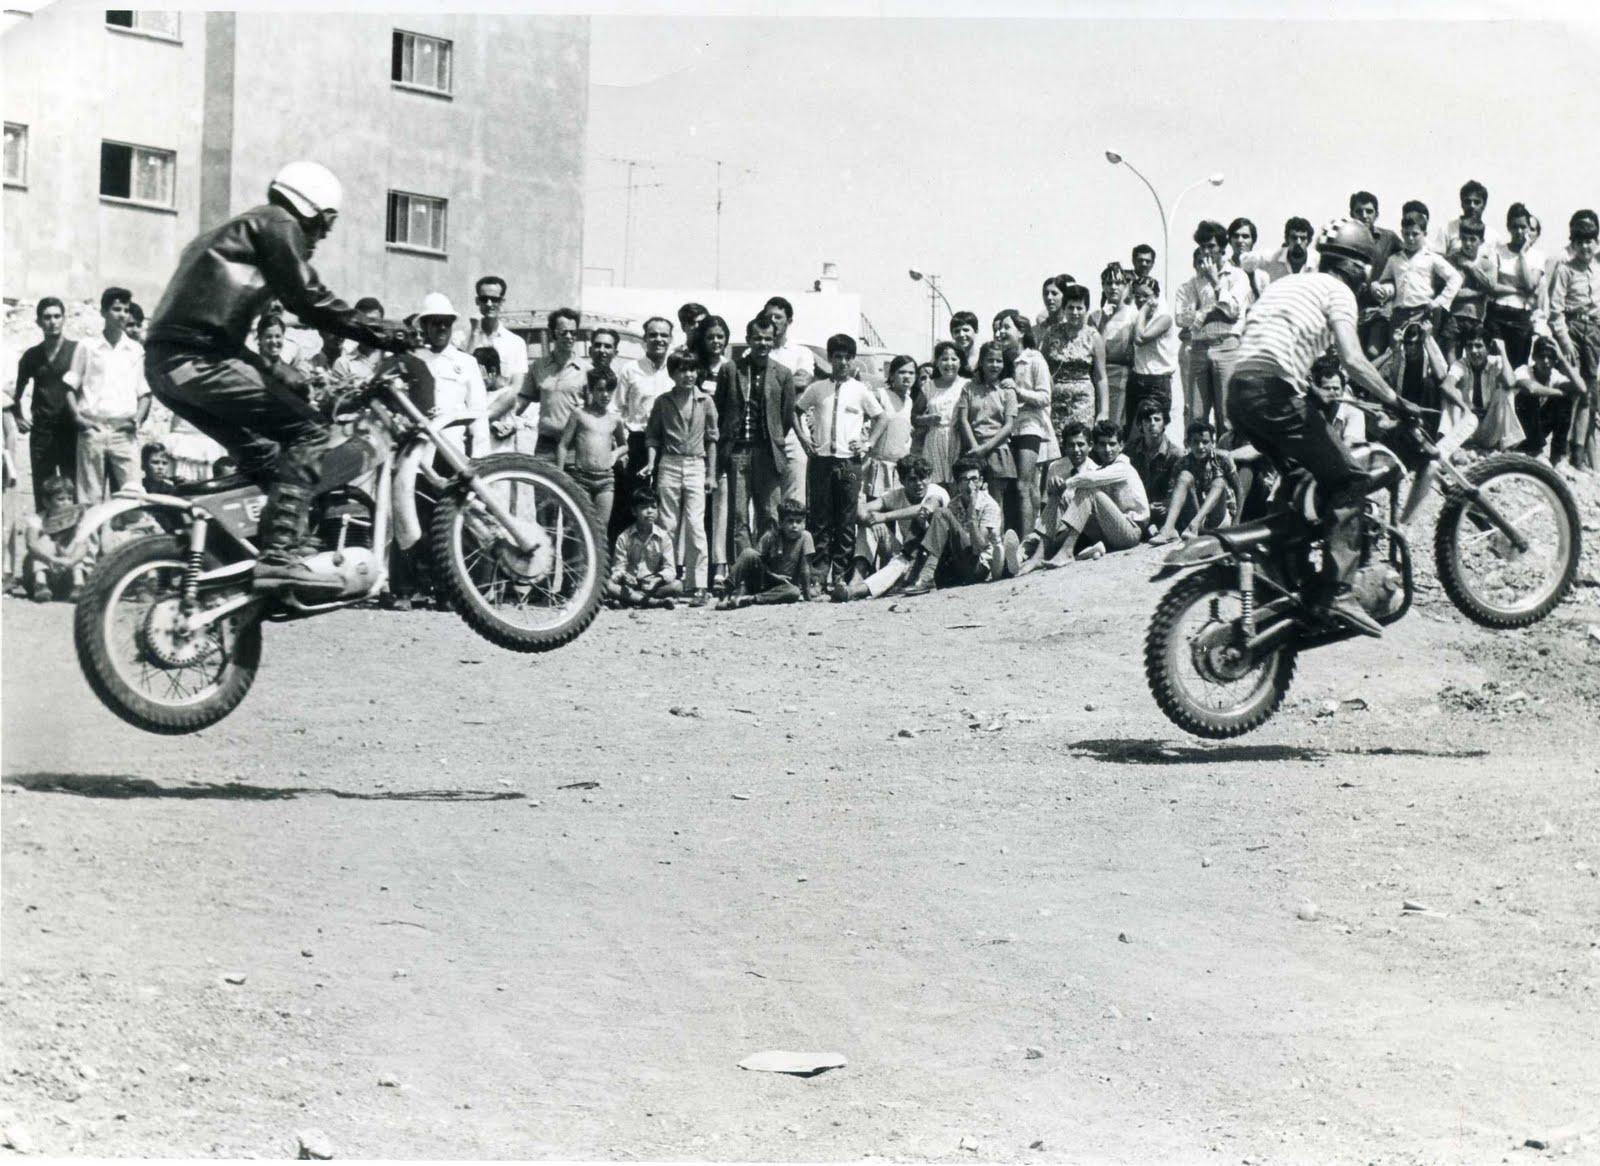 trial - Ducati 250 Trial 1.5